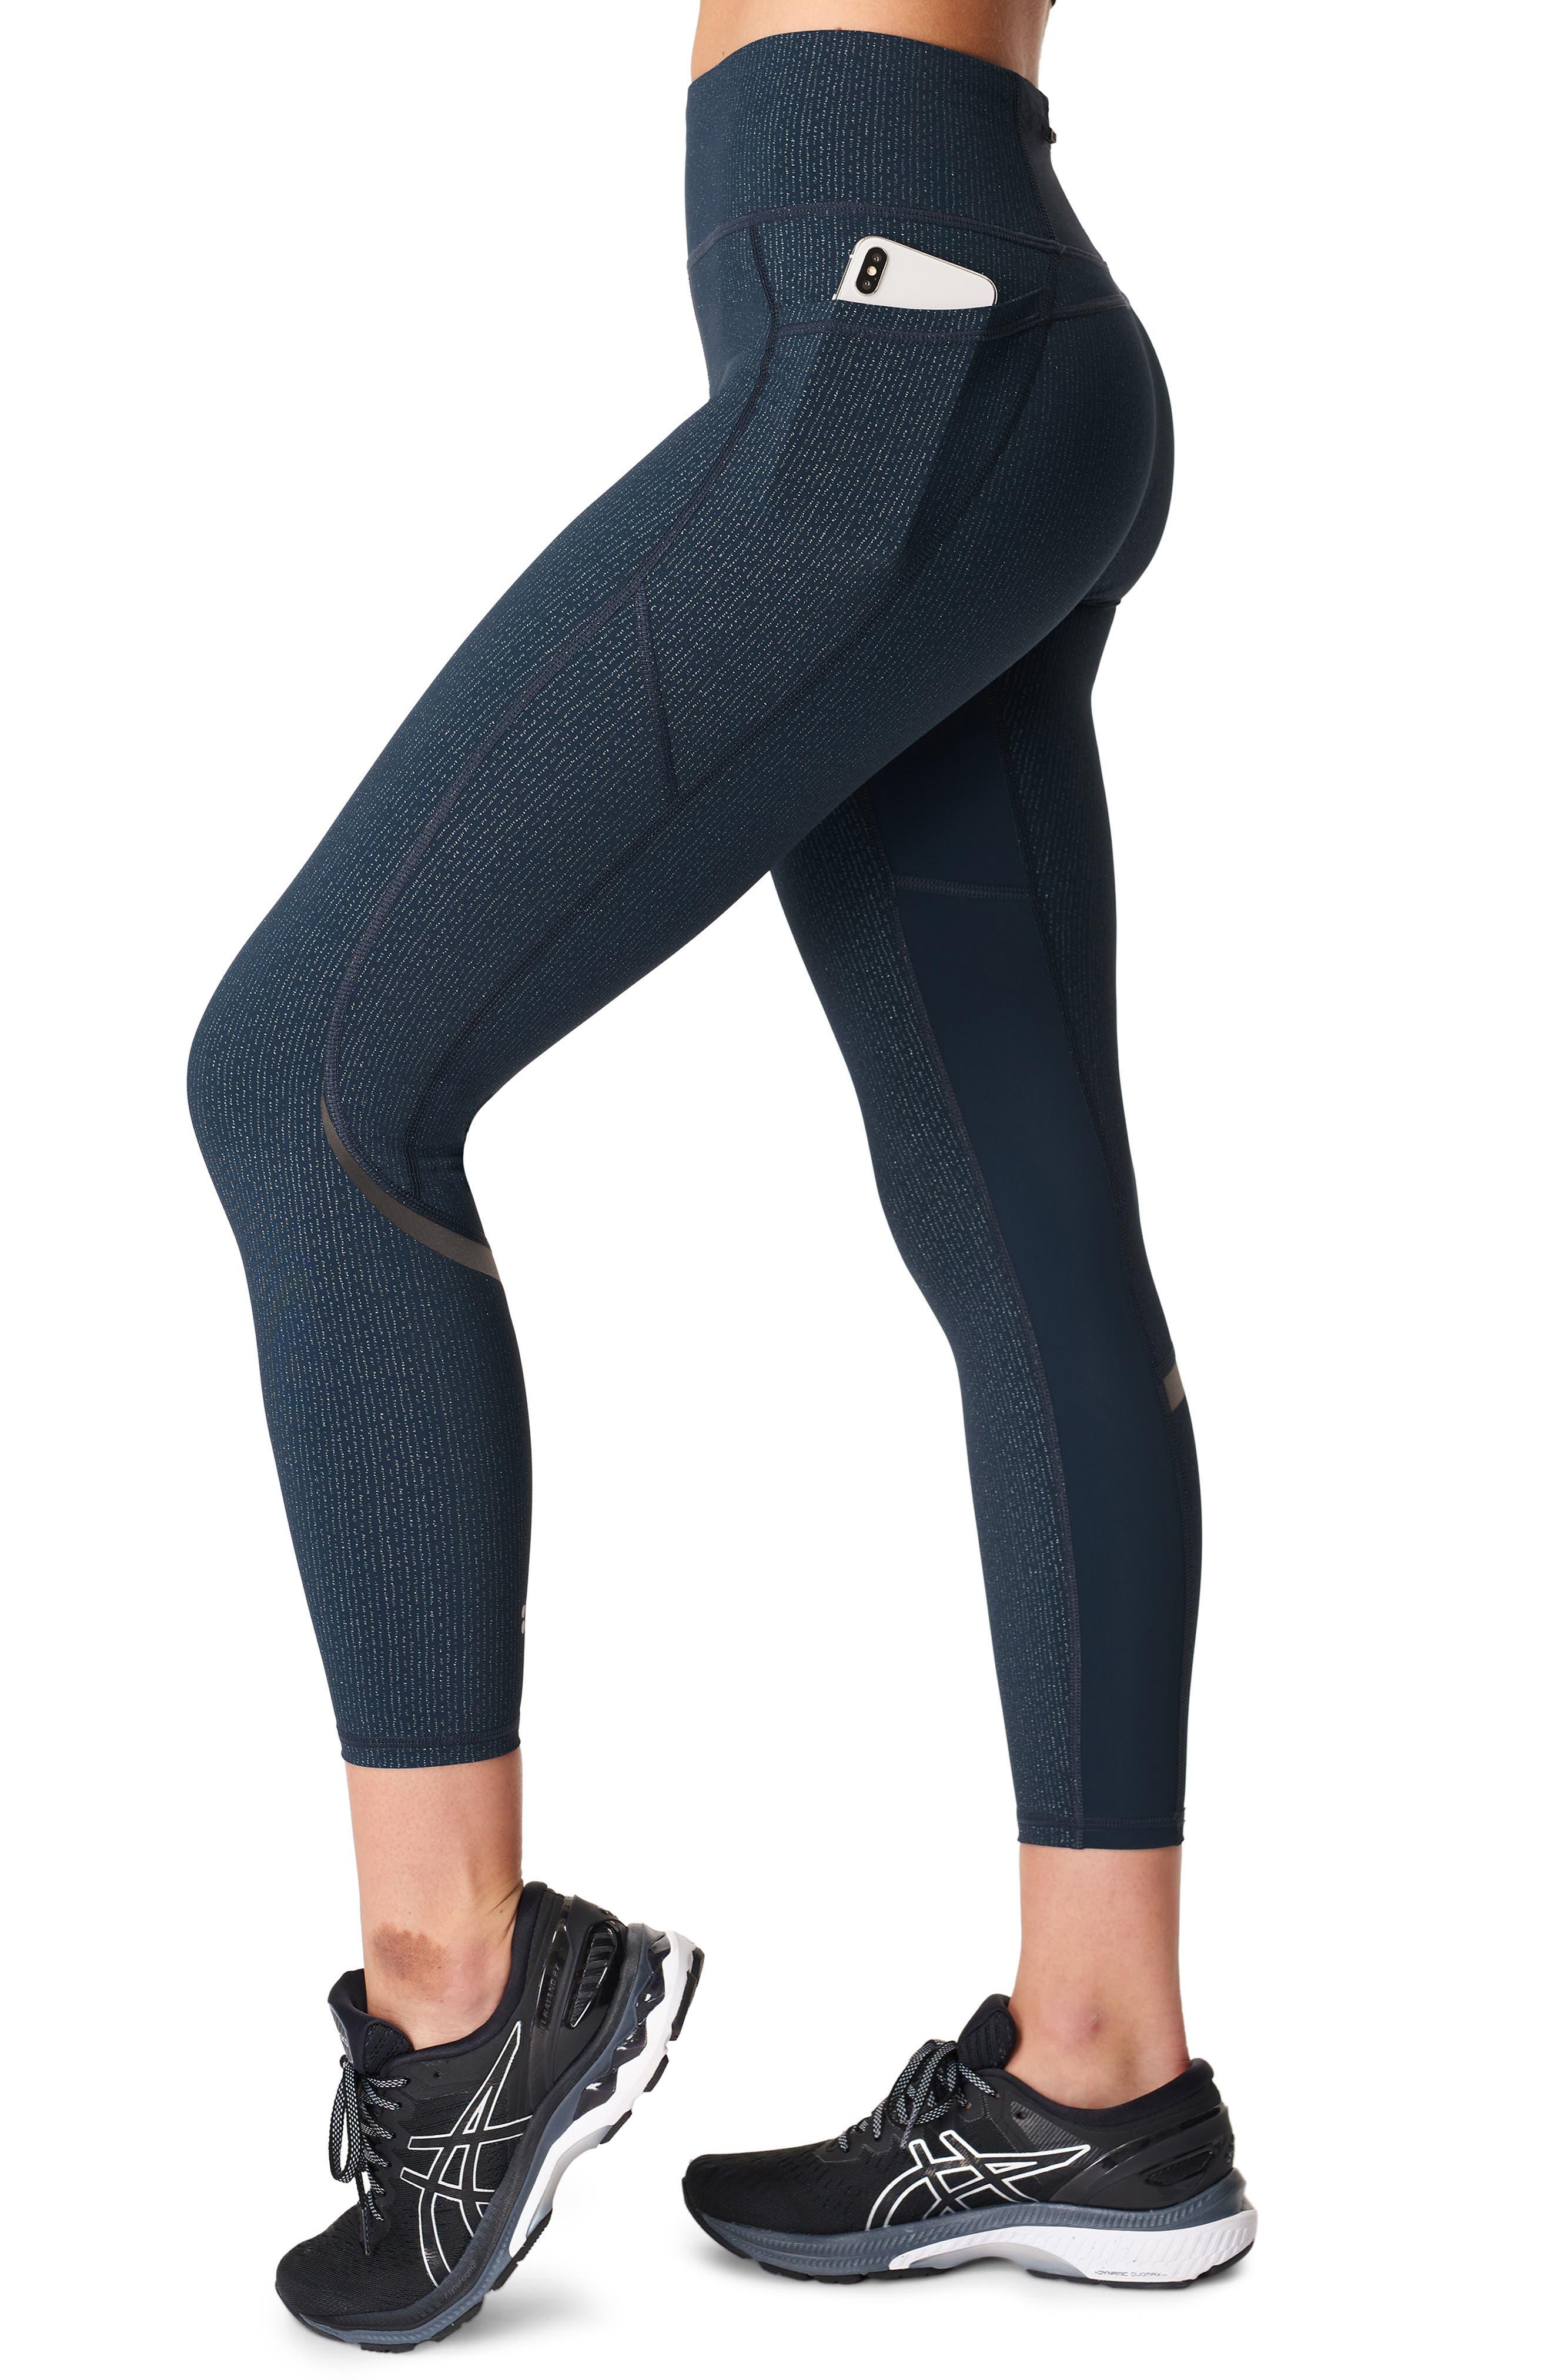 Sweaty Betty Zero Gravity Pocket 7/8 Running Leggings | Nordstrom